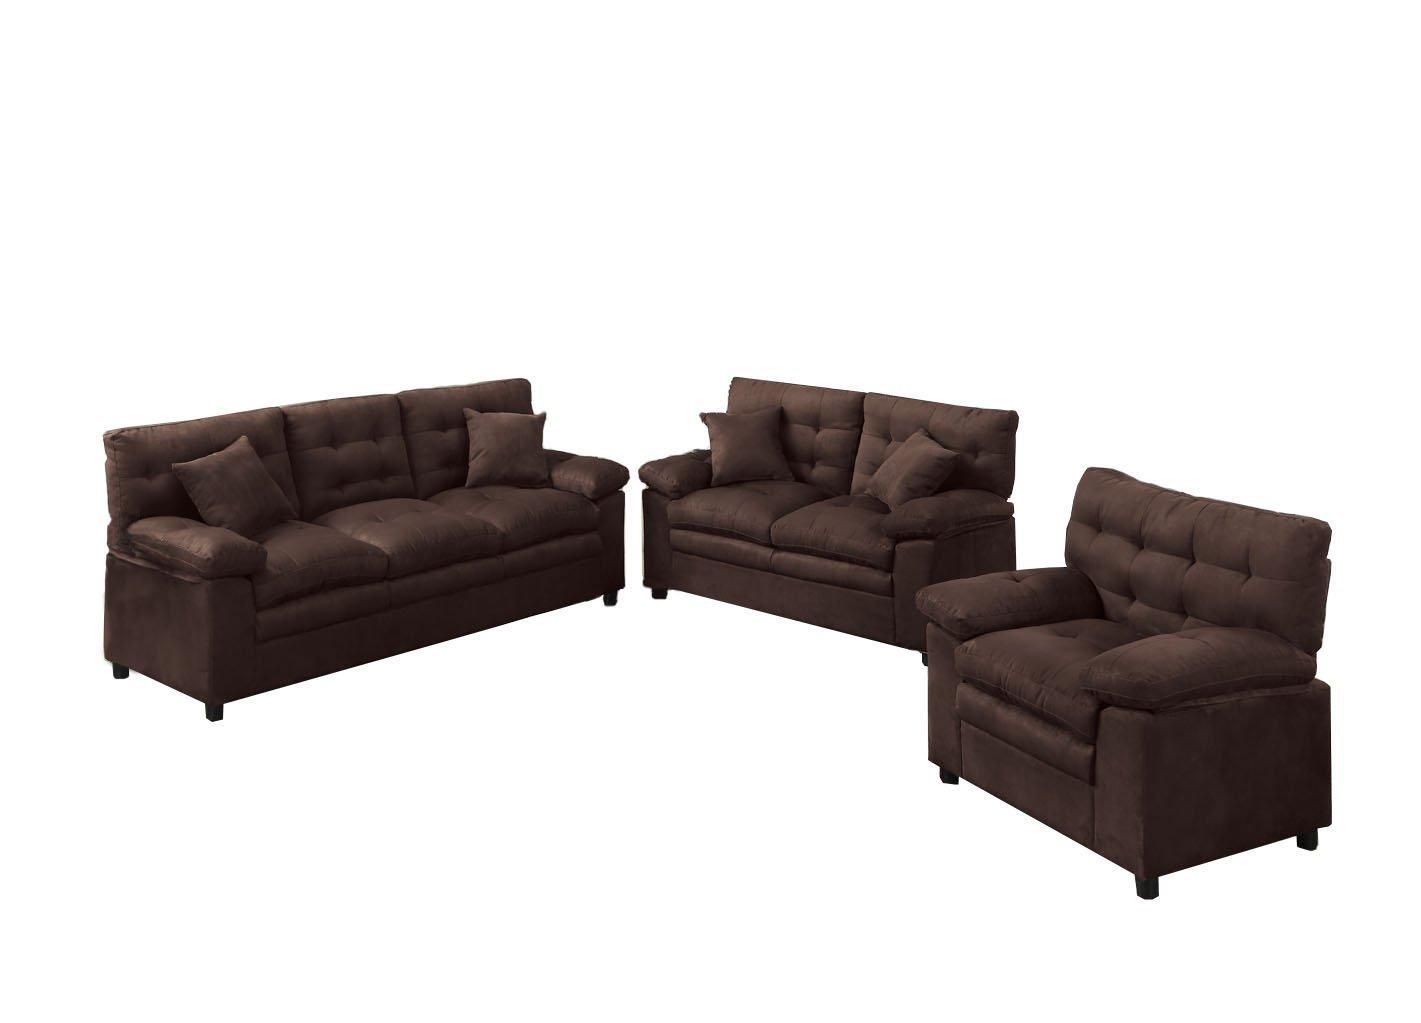 3 Piece Living Room Set  Home Furniture Design